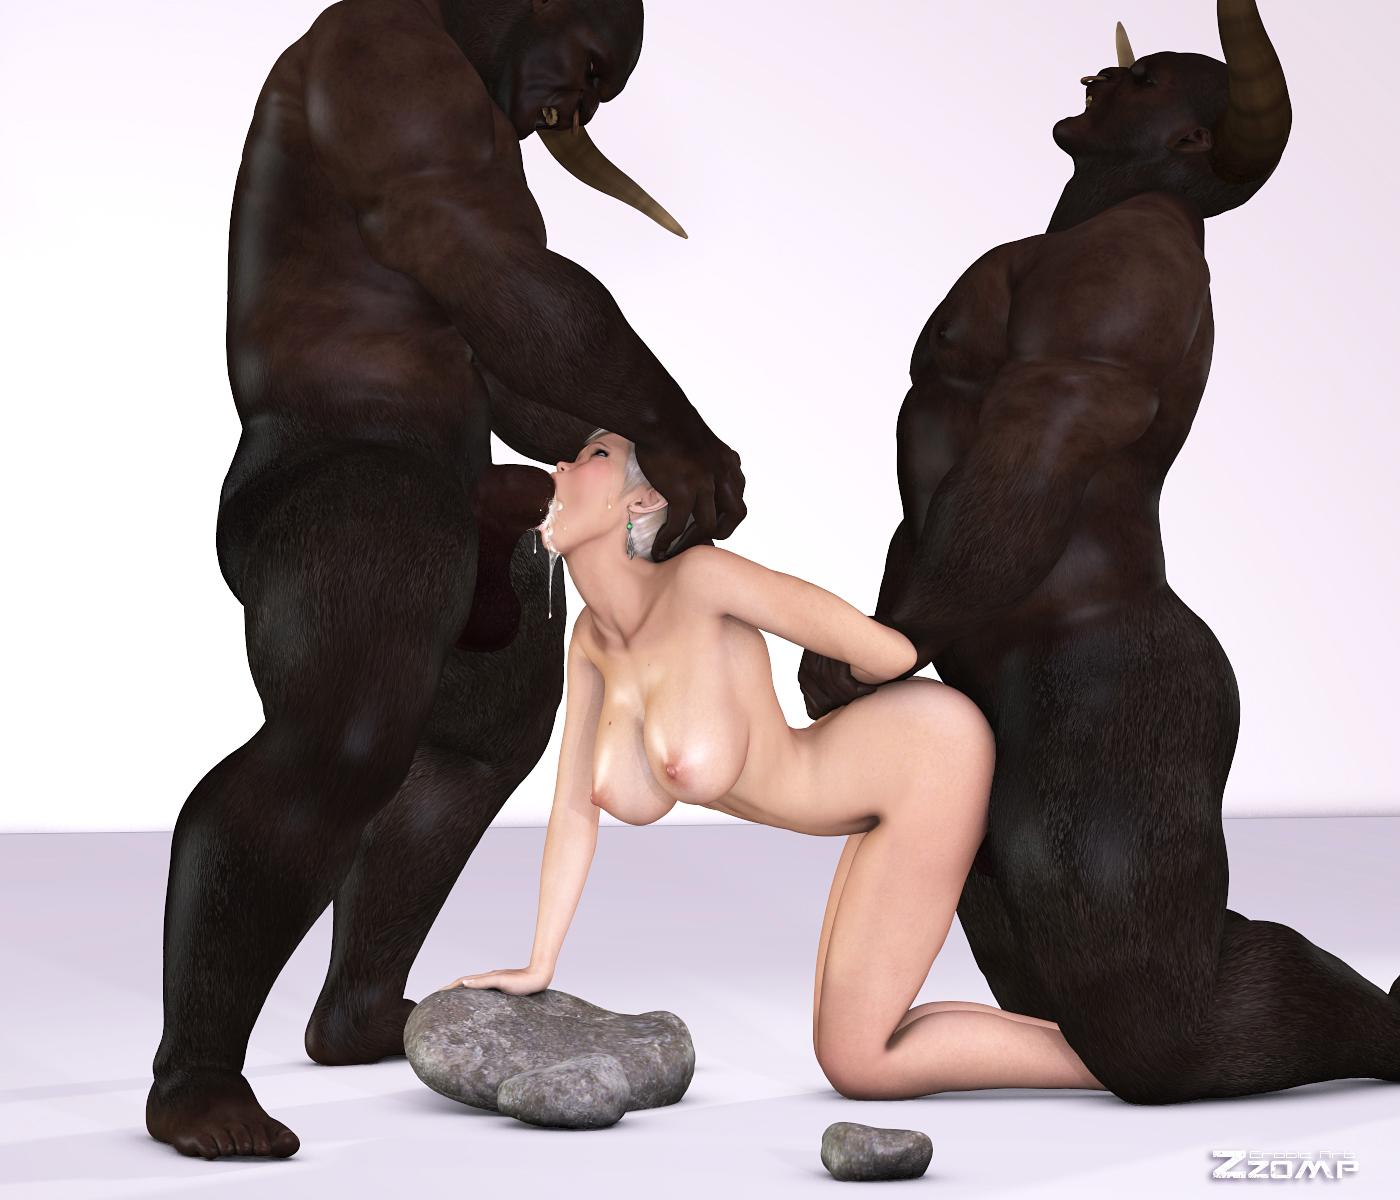 Very hot cartoon monster sex videos erotic girlfriends